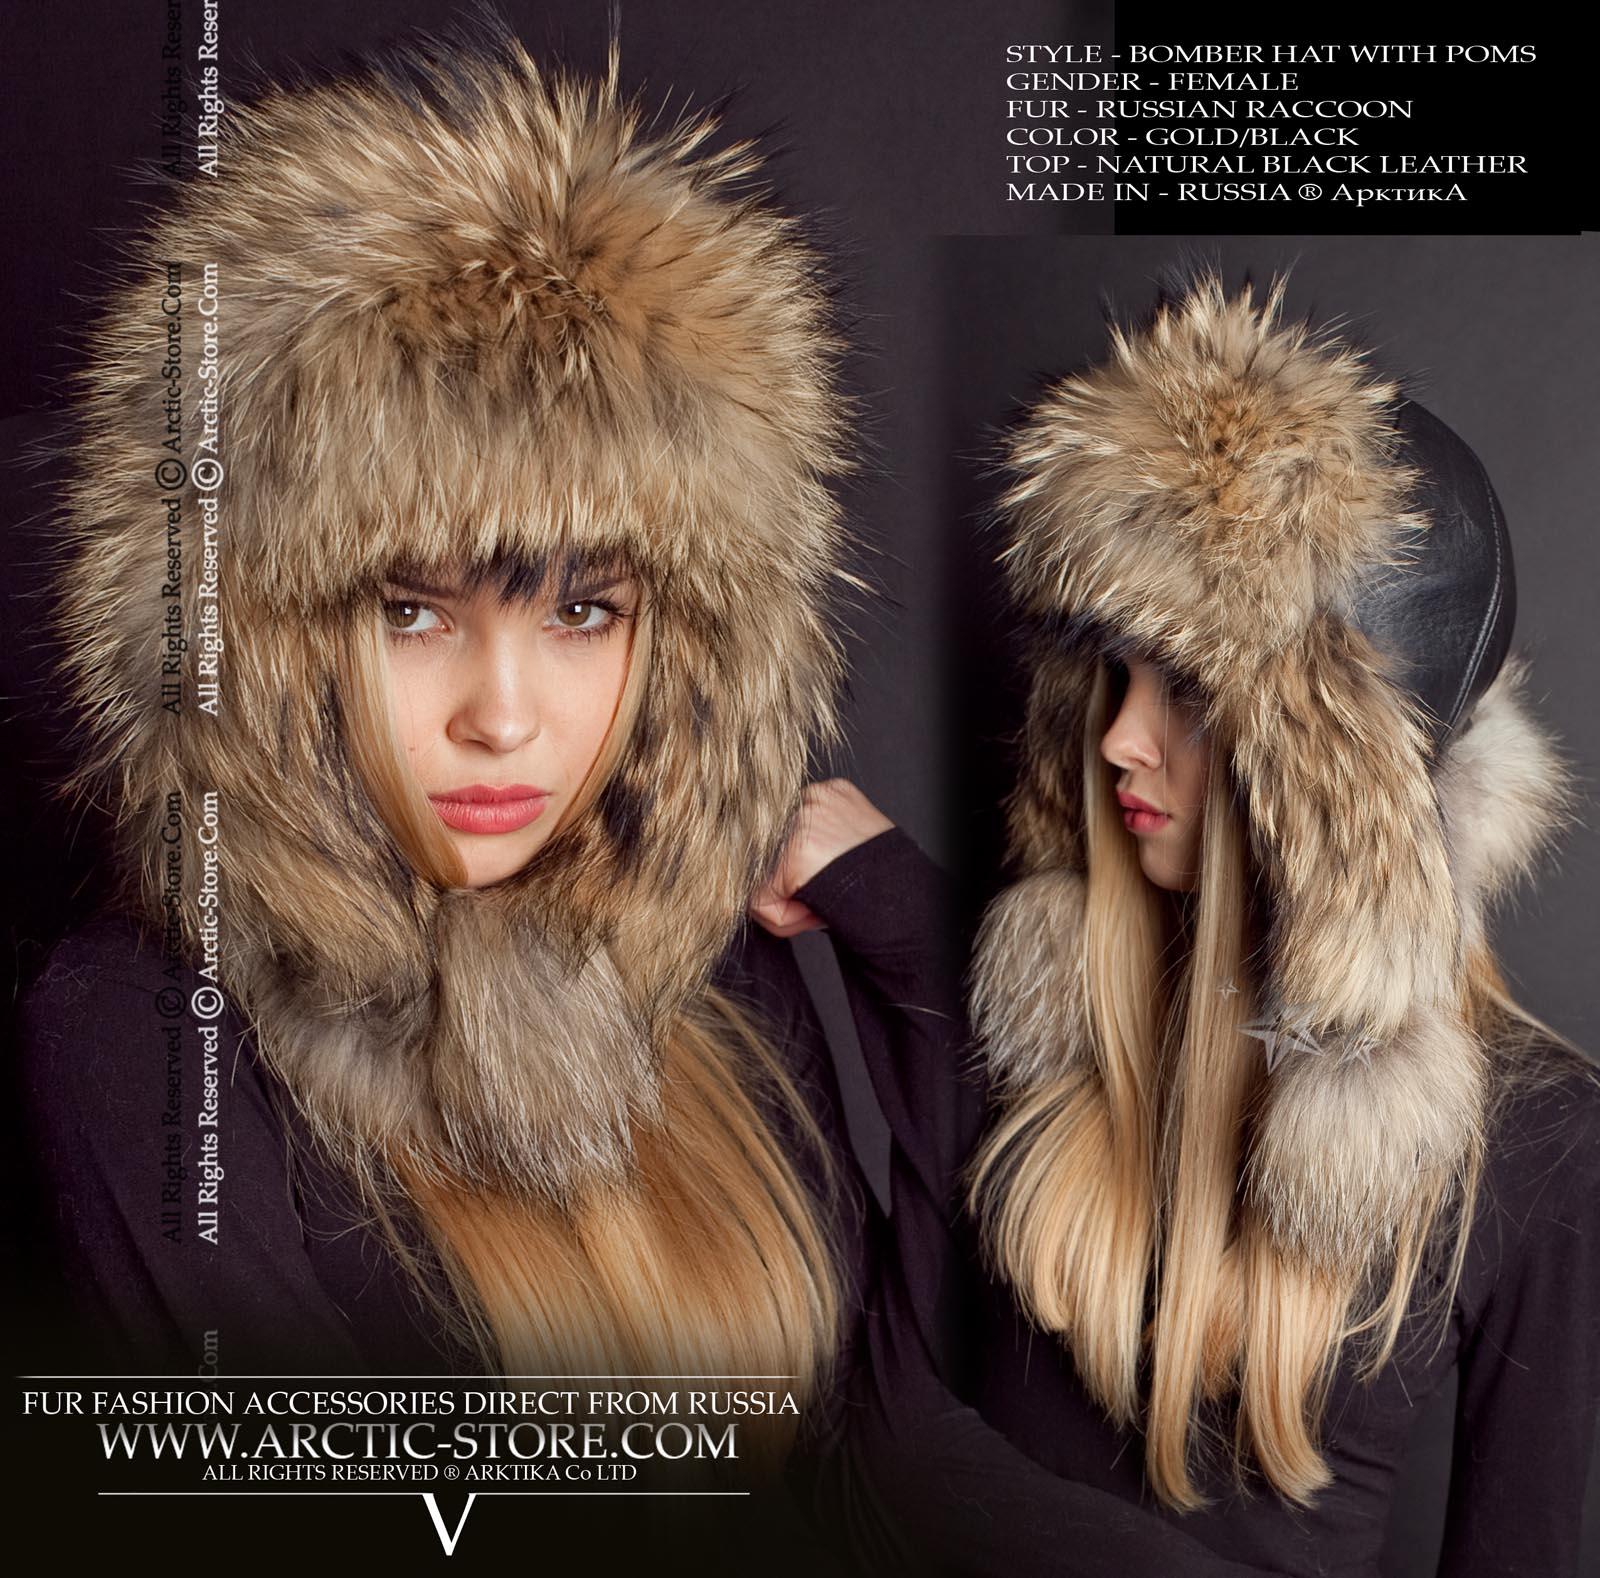 e9e4e257ea5 Russian raccoon bomber hat - women s fur ushanka - arctic-store